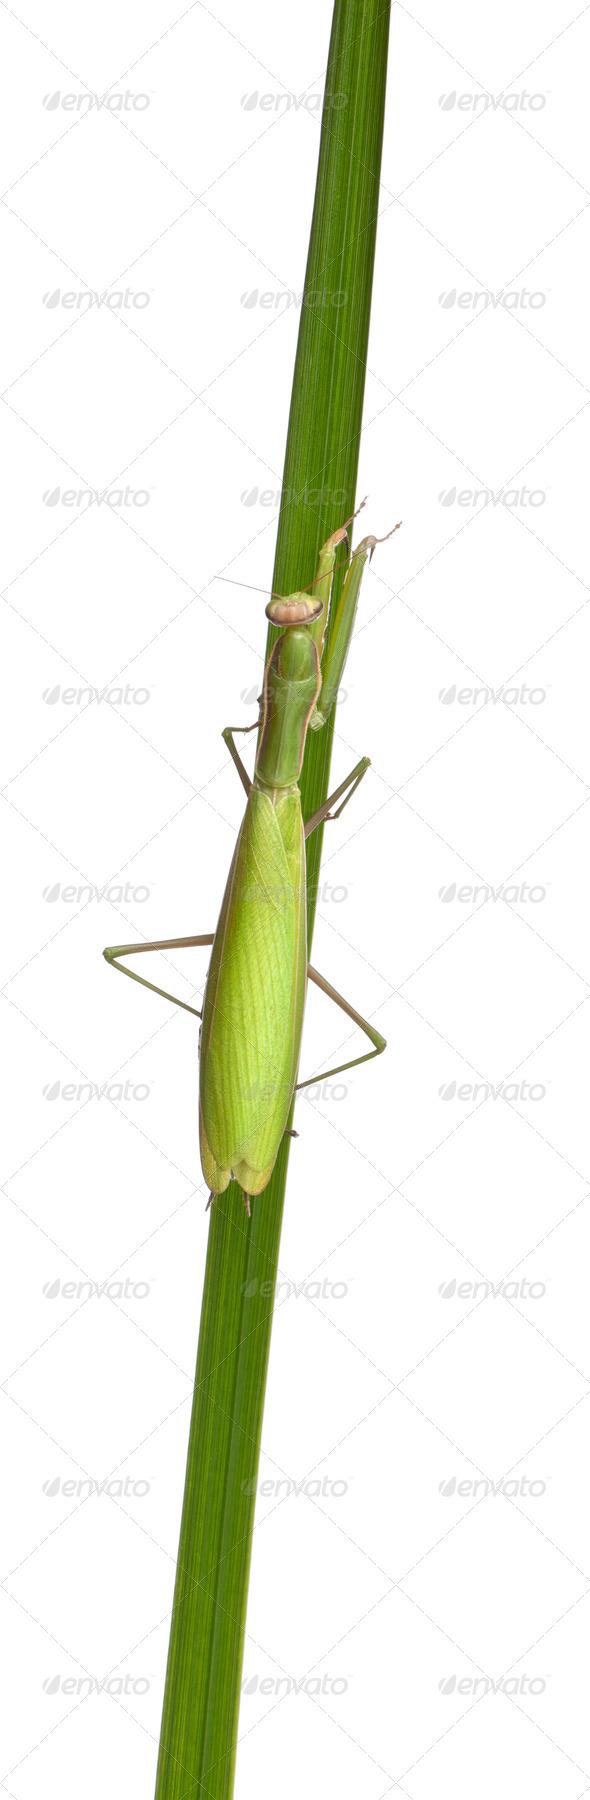 Female European Mantis or Praying Mantis, Mantis religiosa, in front of white background - Stock Photo - Images